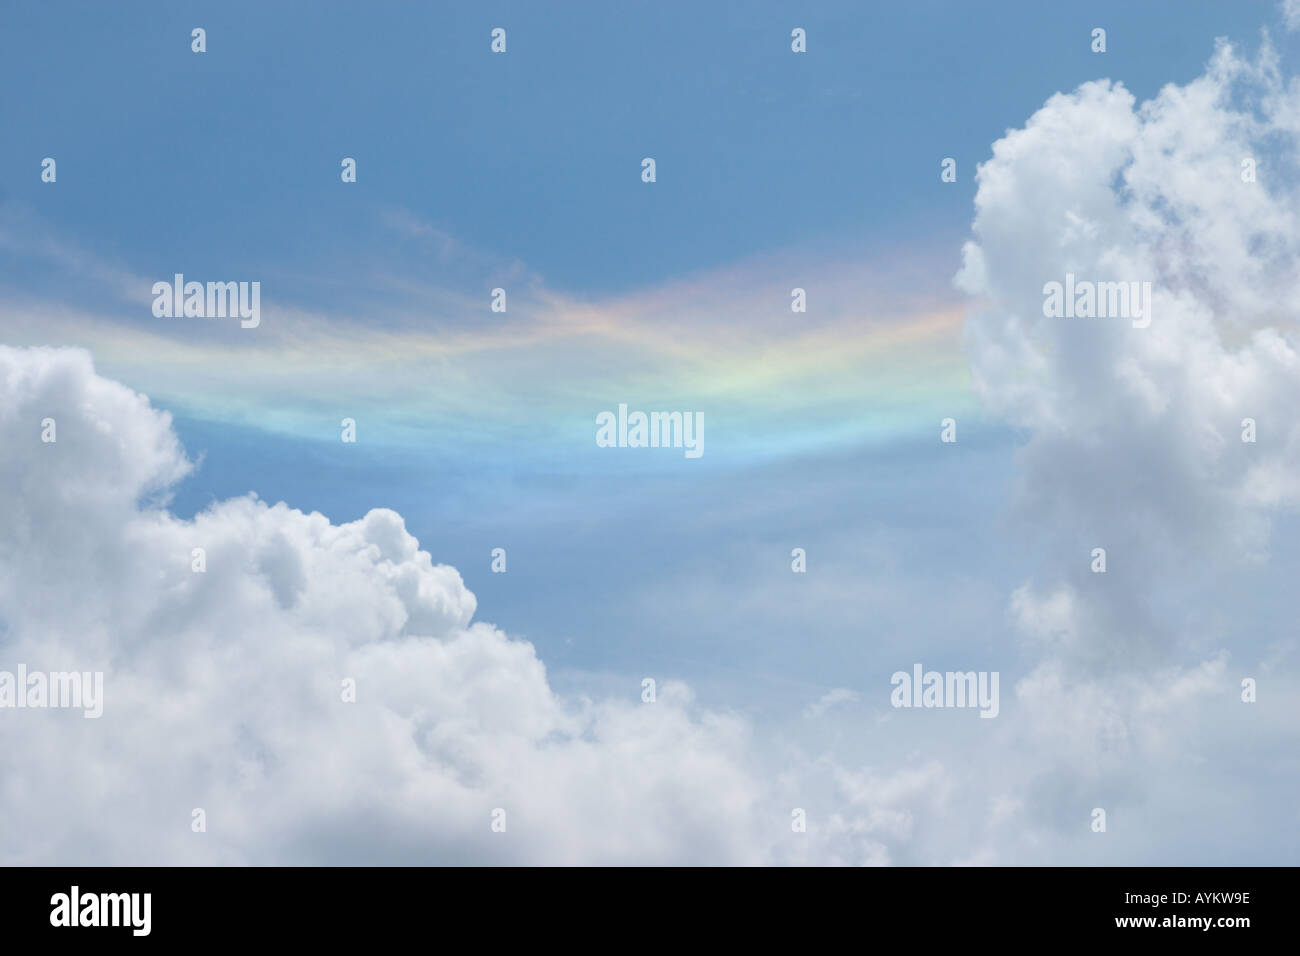 a colorful circumhorizon arc rare beautiful weather phenomena - Stock Image